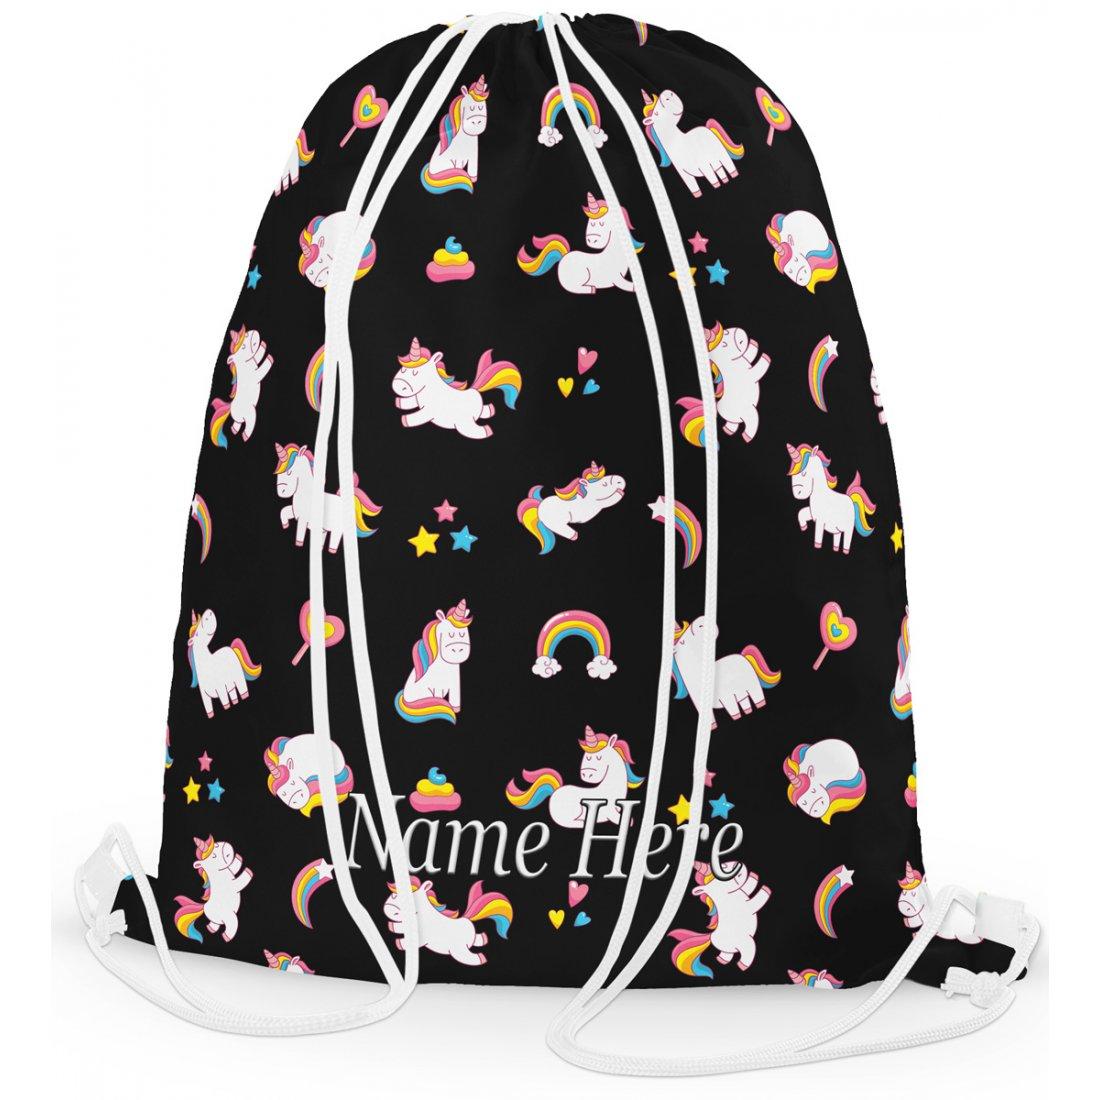 Personalised Unicorn Printed Pattern Gym Bag